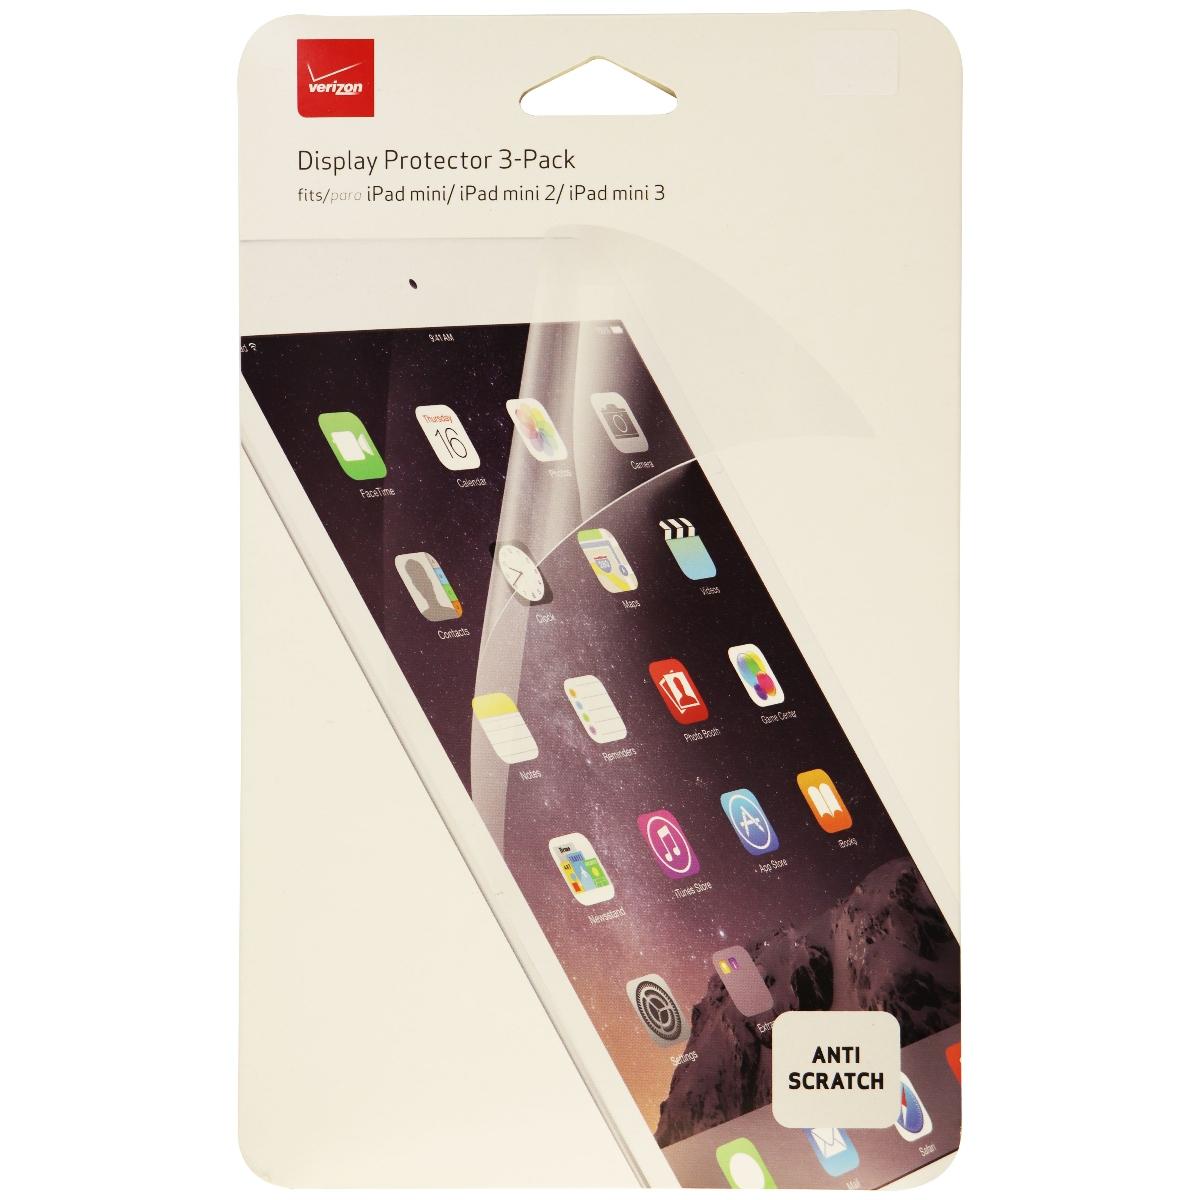 Verizon Anti-Scratch Display Screen Protector 3 Pack Apple iPad mini 2 3 - Clear